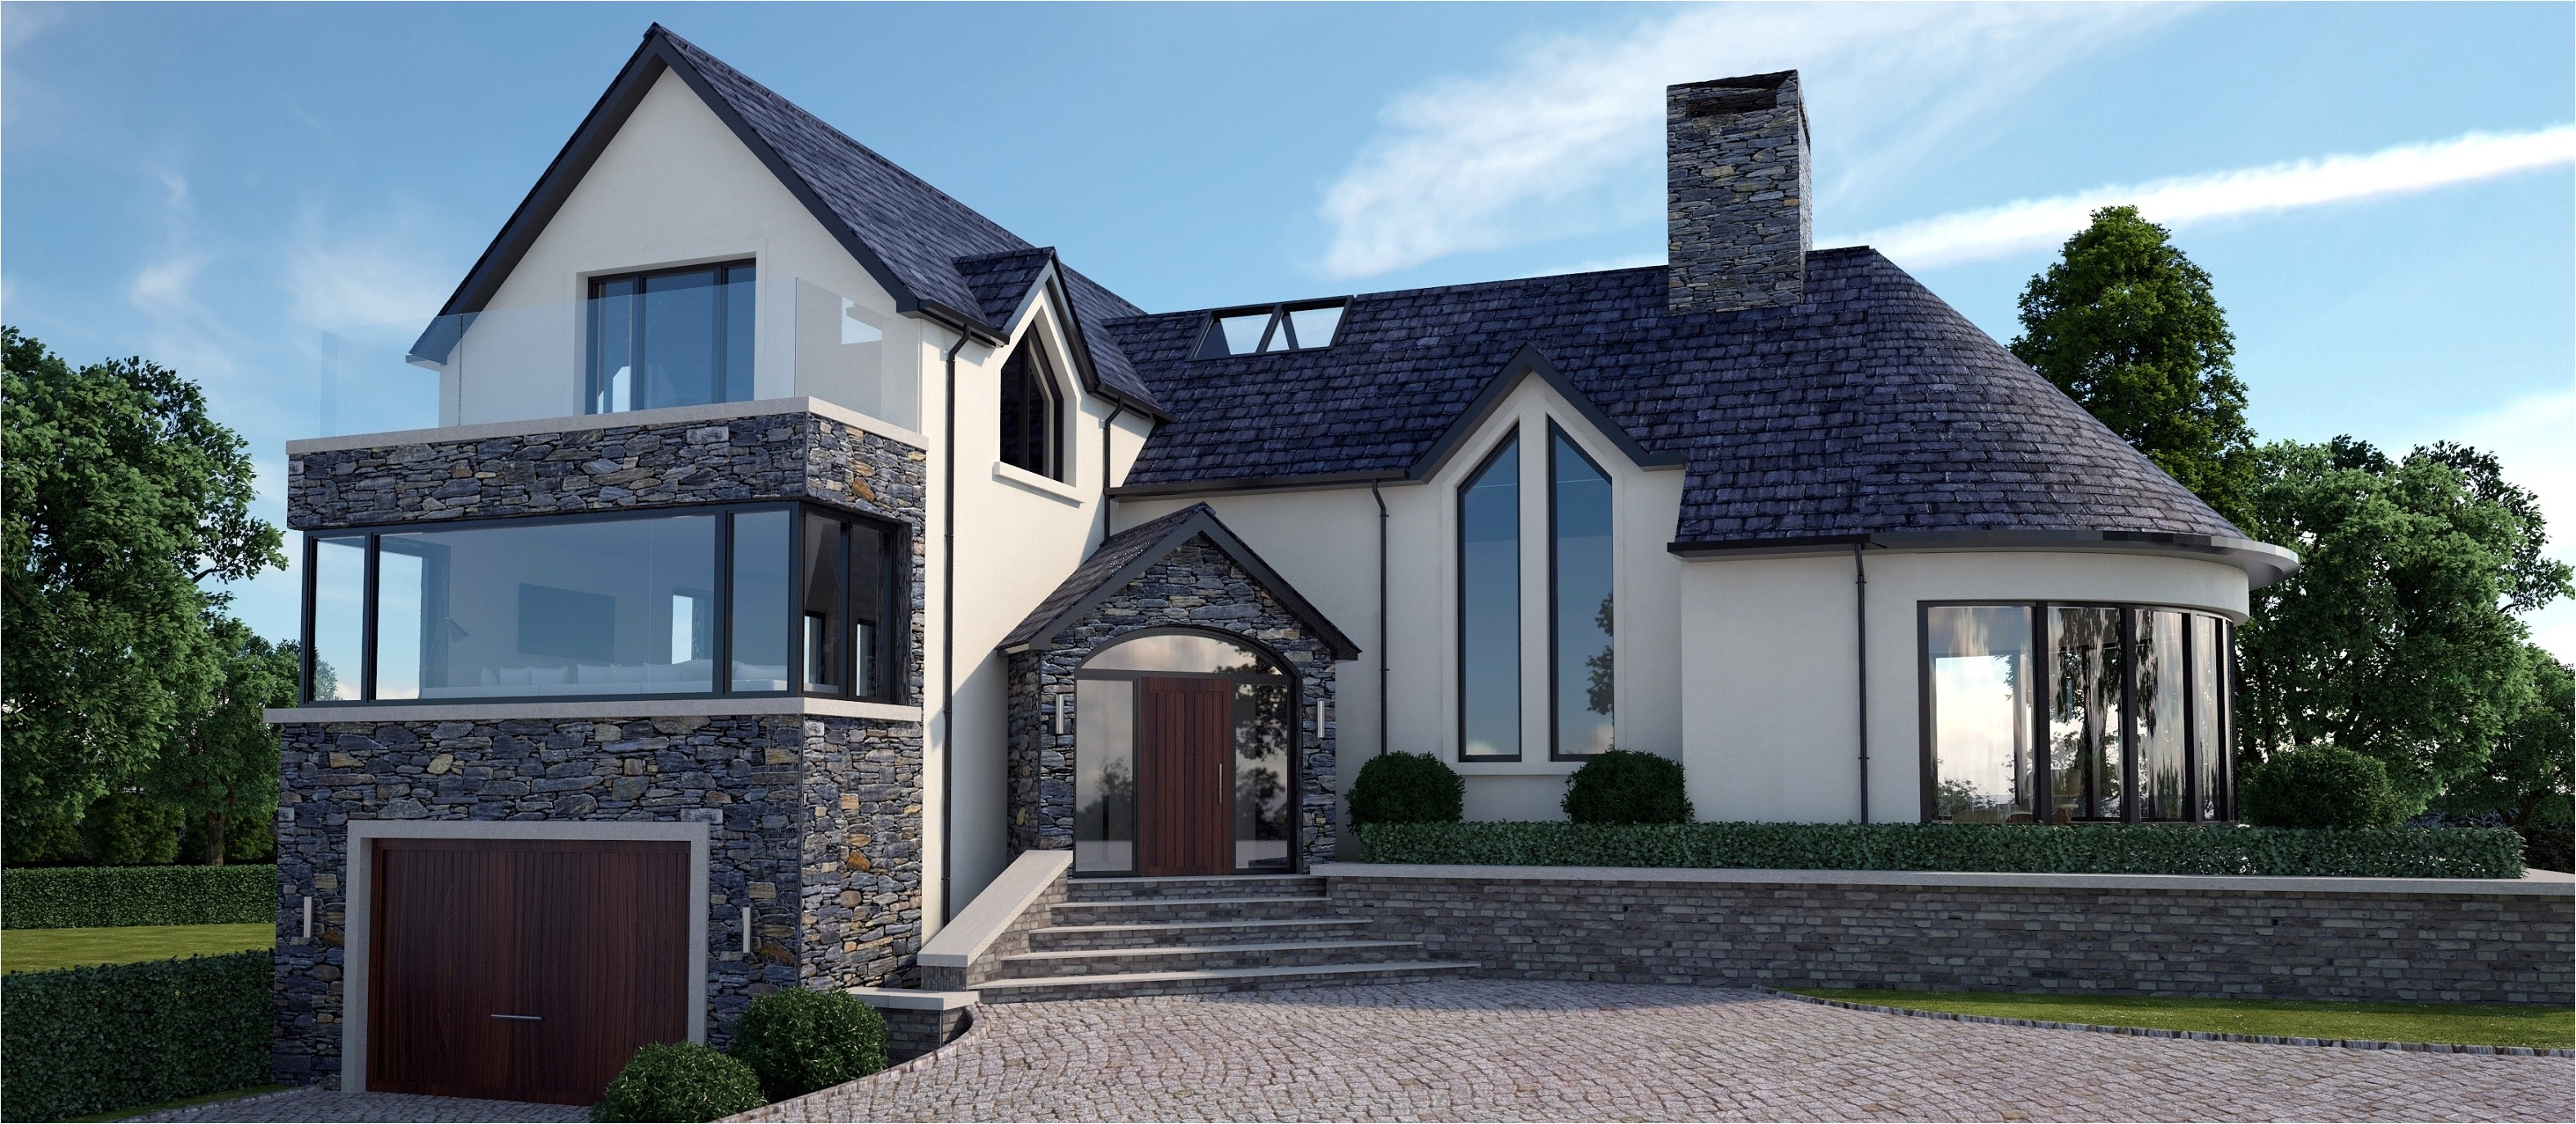 dormer house plans designs ireland